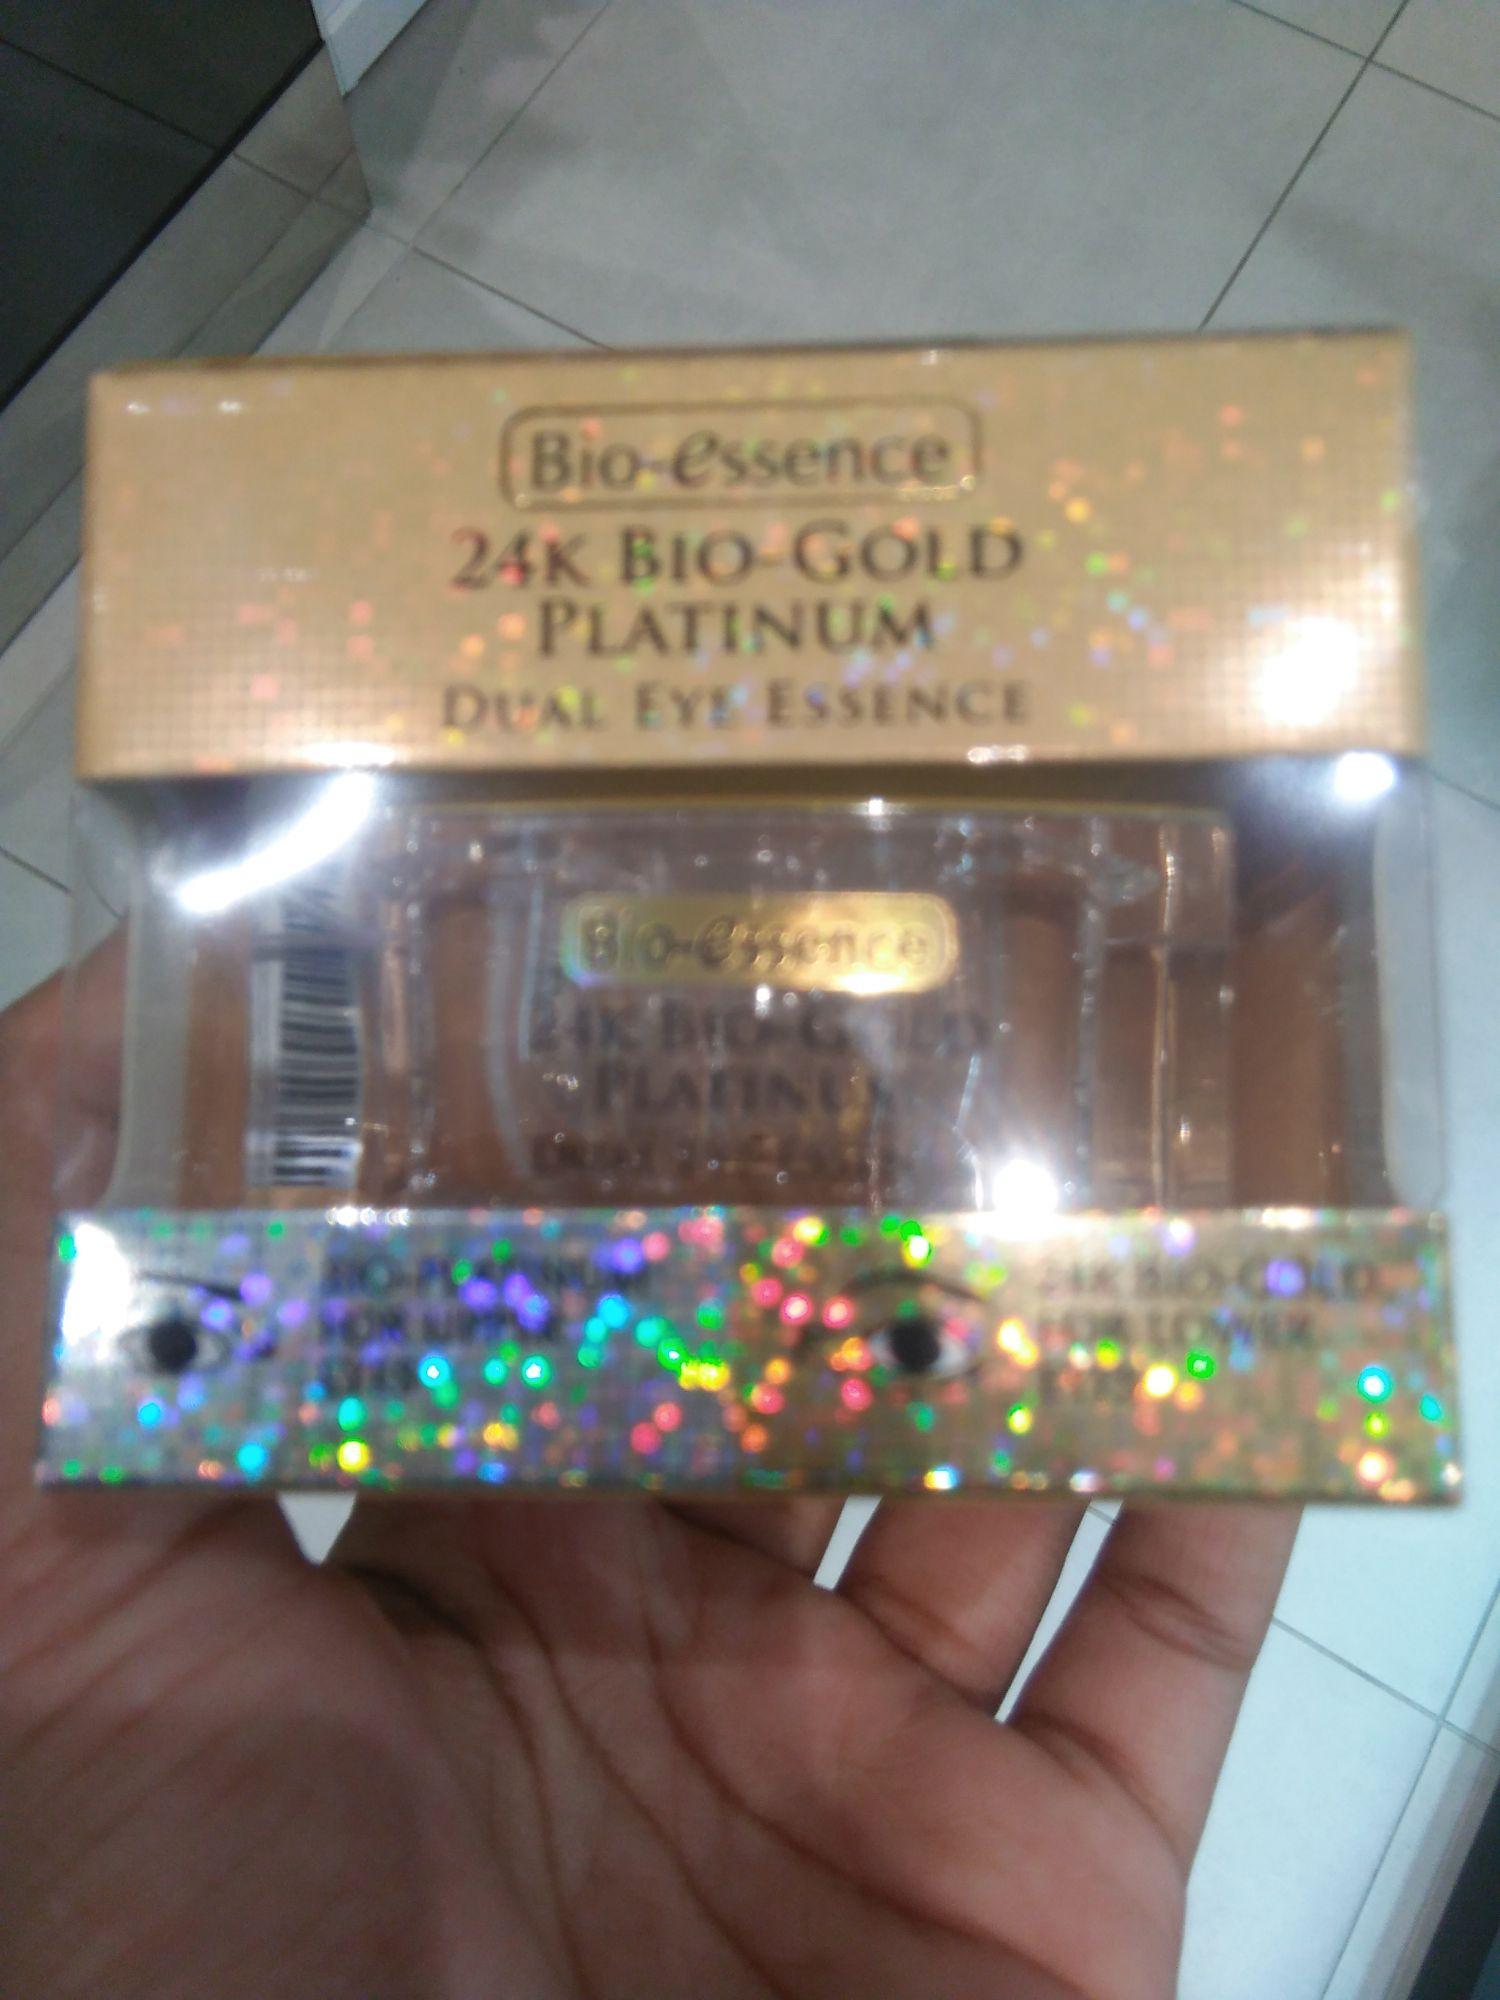 Sy gunakan Bio-Essence 24k Bio-Gold Dual Eye Essence ni sbgai eye treatment pd waktu malam & sbgai make base utk eye make up.Tekstur gelnya sgt selesa ...